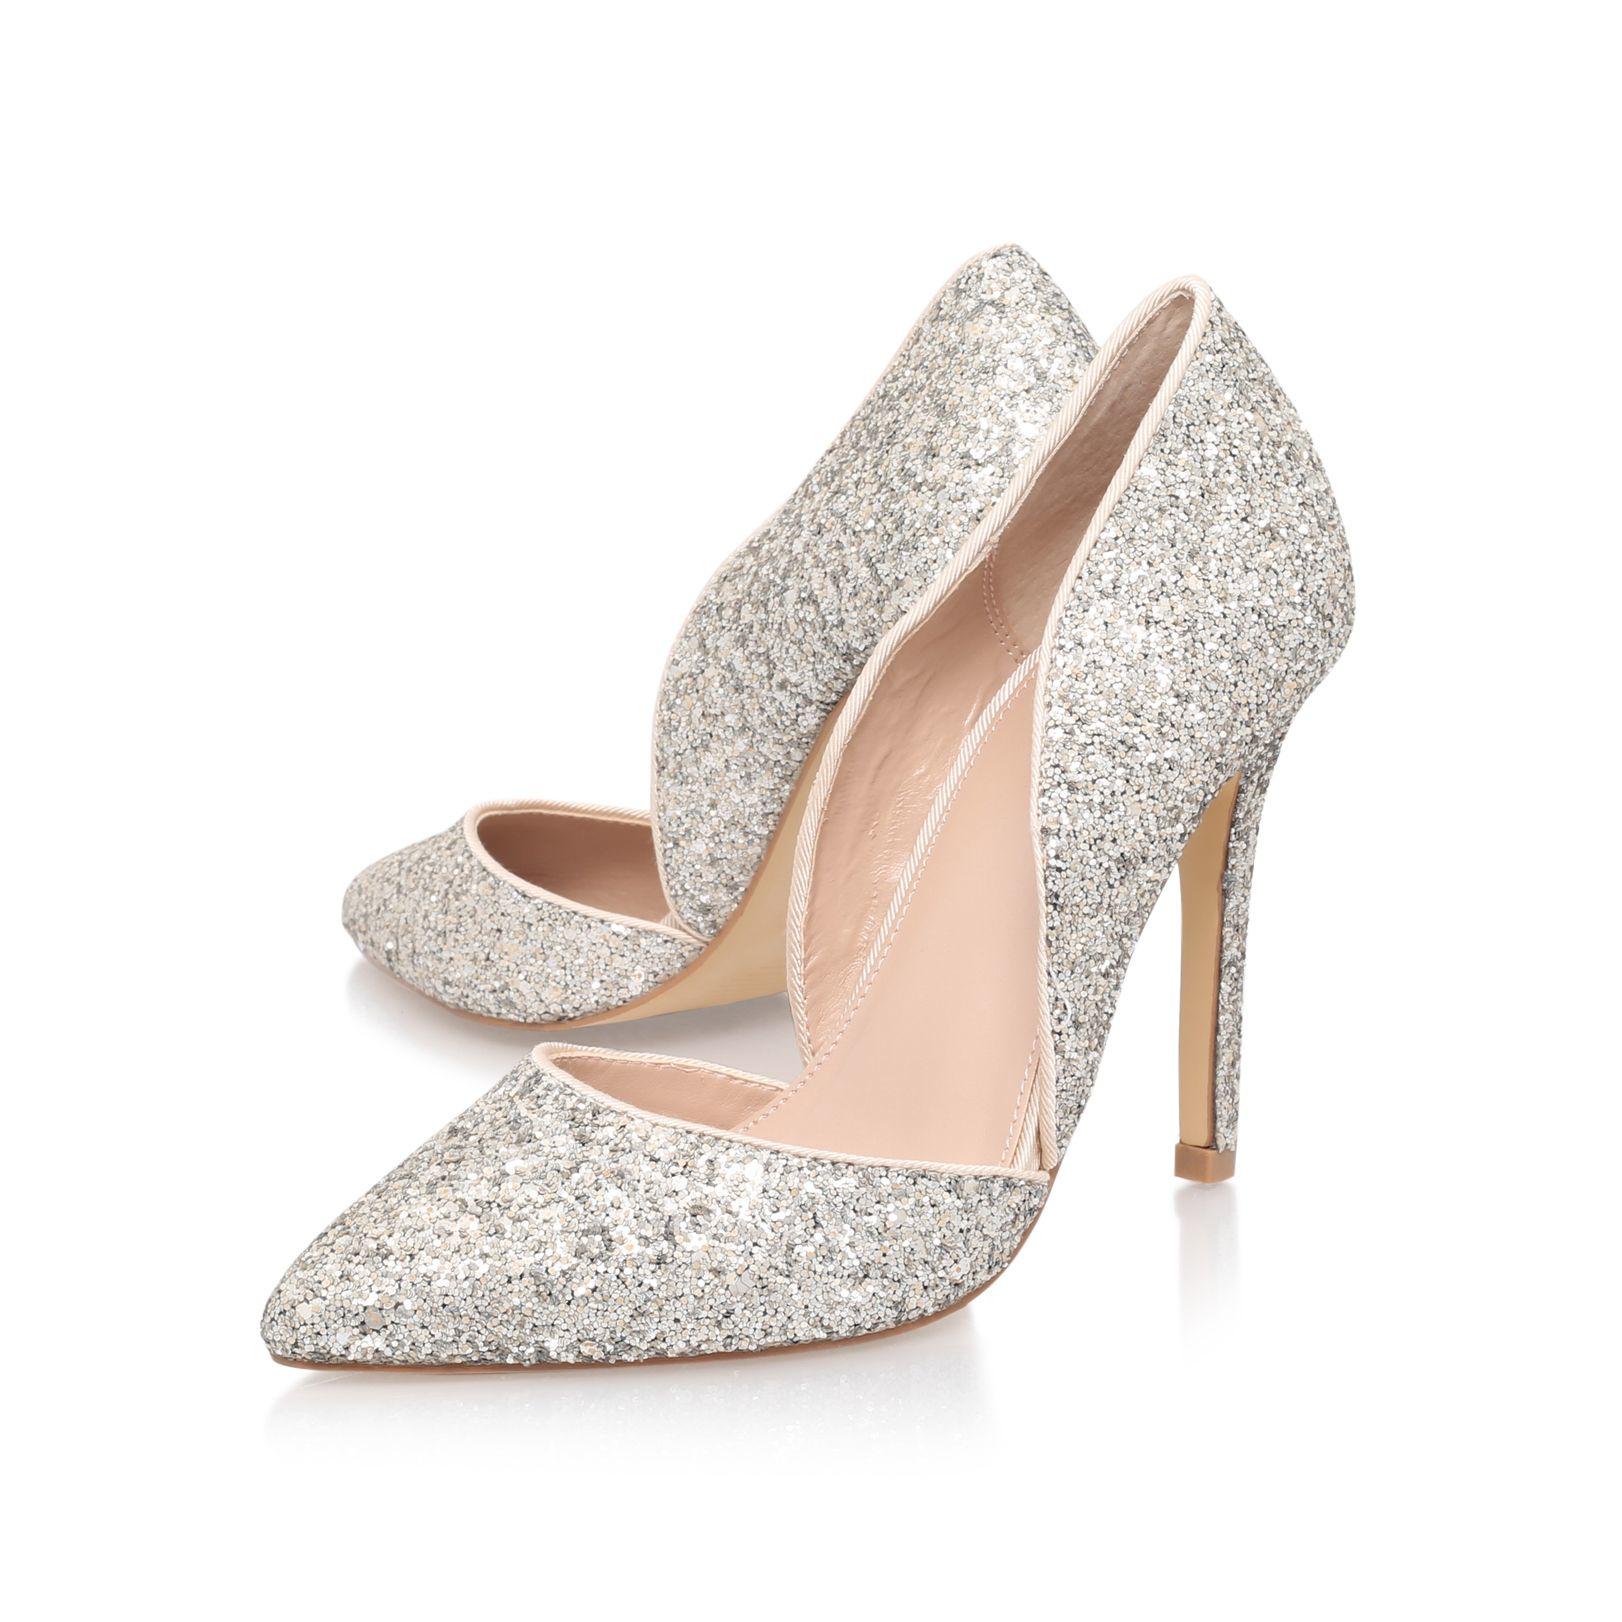 carvela kurt geiger lexi high heel court shoes in metallic lyst. Black Bedroom Furniture Sets. Home Design Ideas